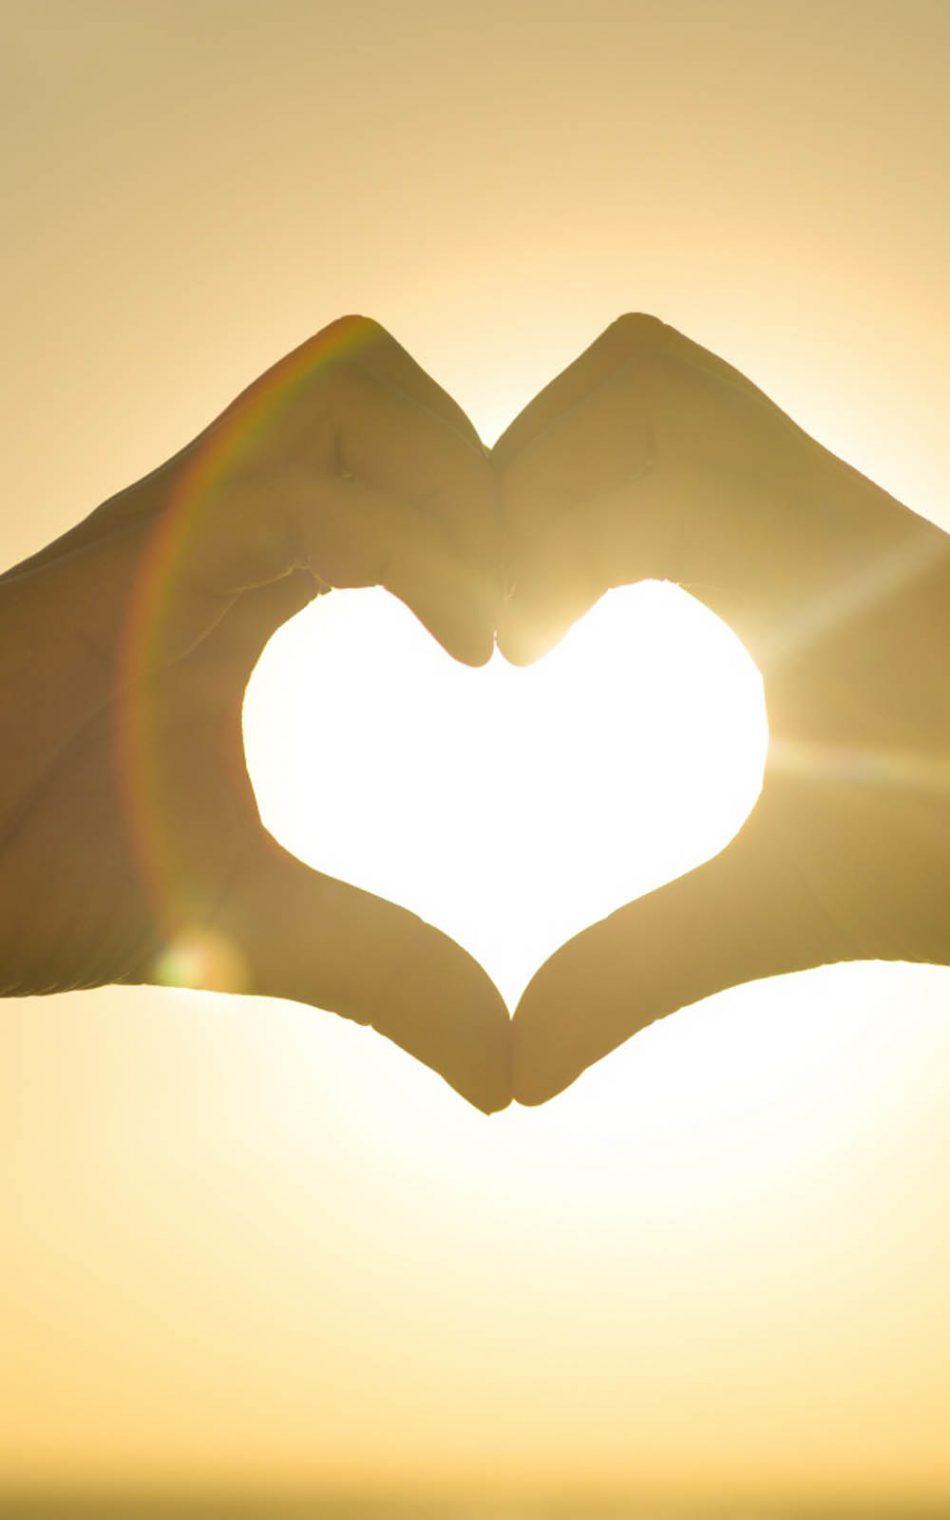 Hands Heart Sun Hd Mobile Wallpaper - Love Picture Light Background - HD Wallpaper